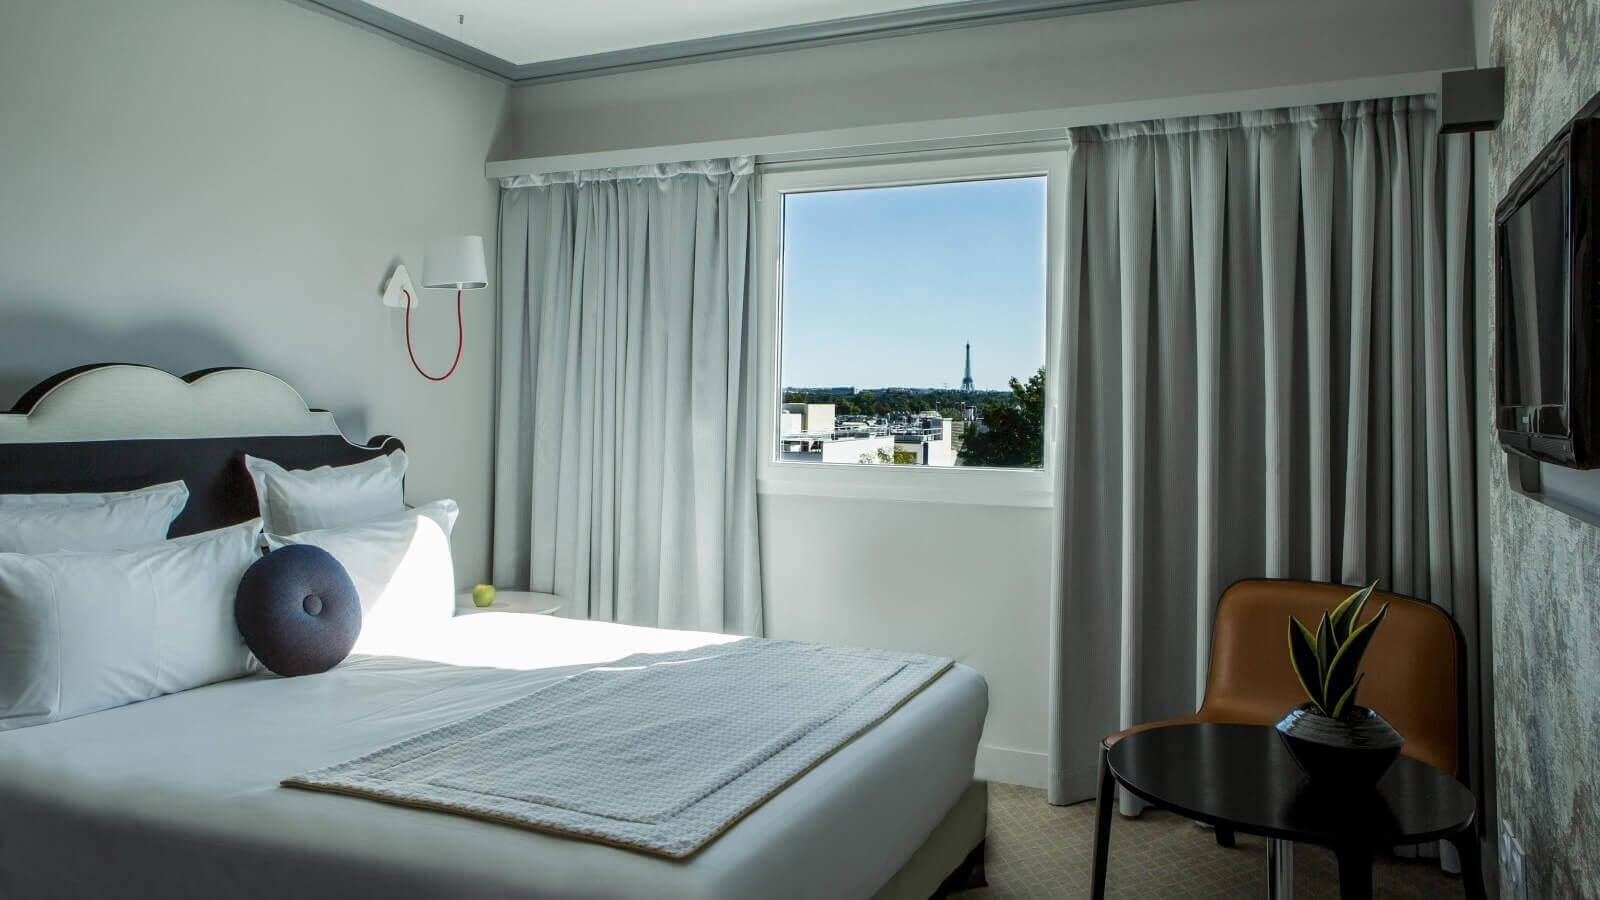 Atrium Hotel Suresnes - Zimmer